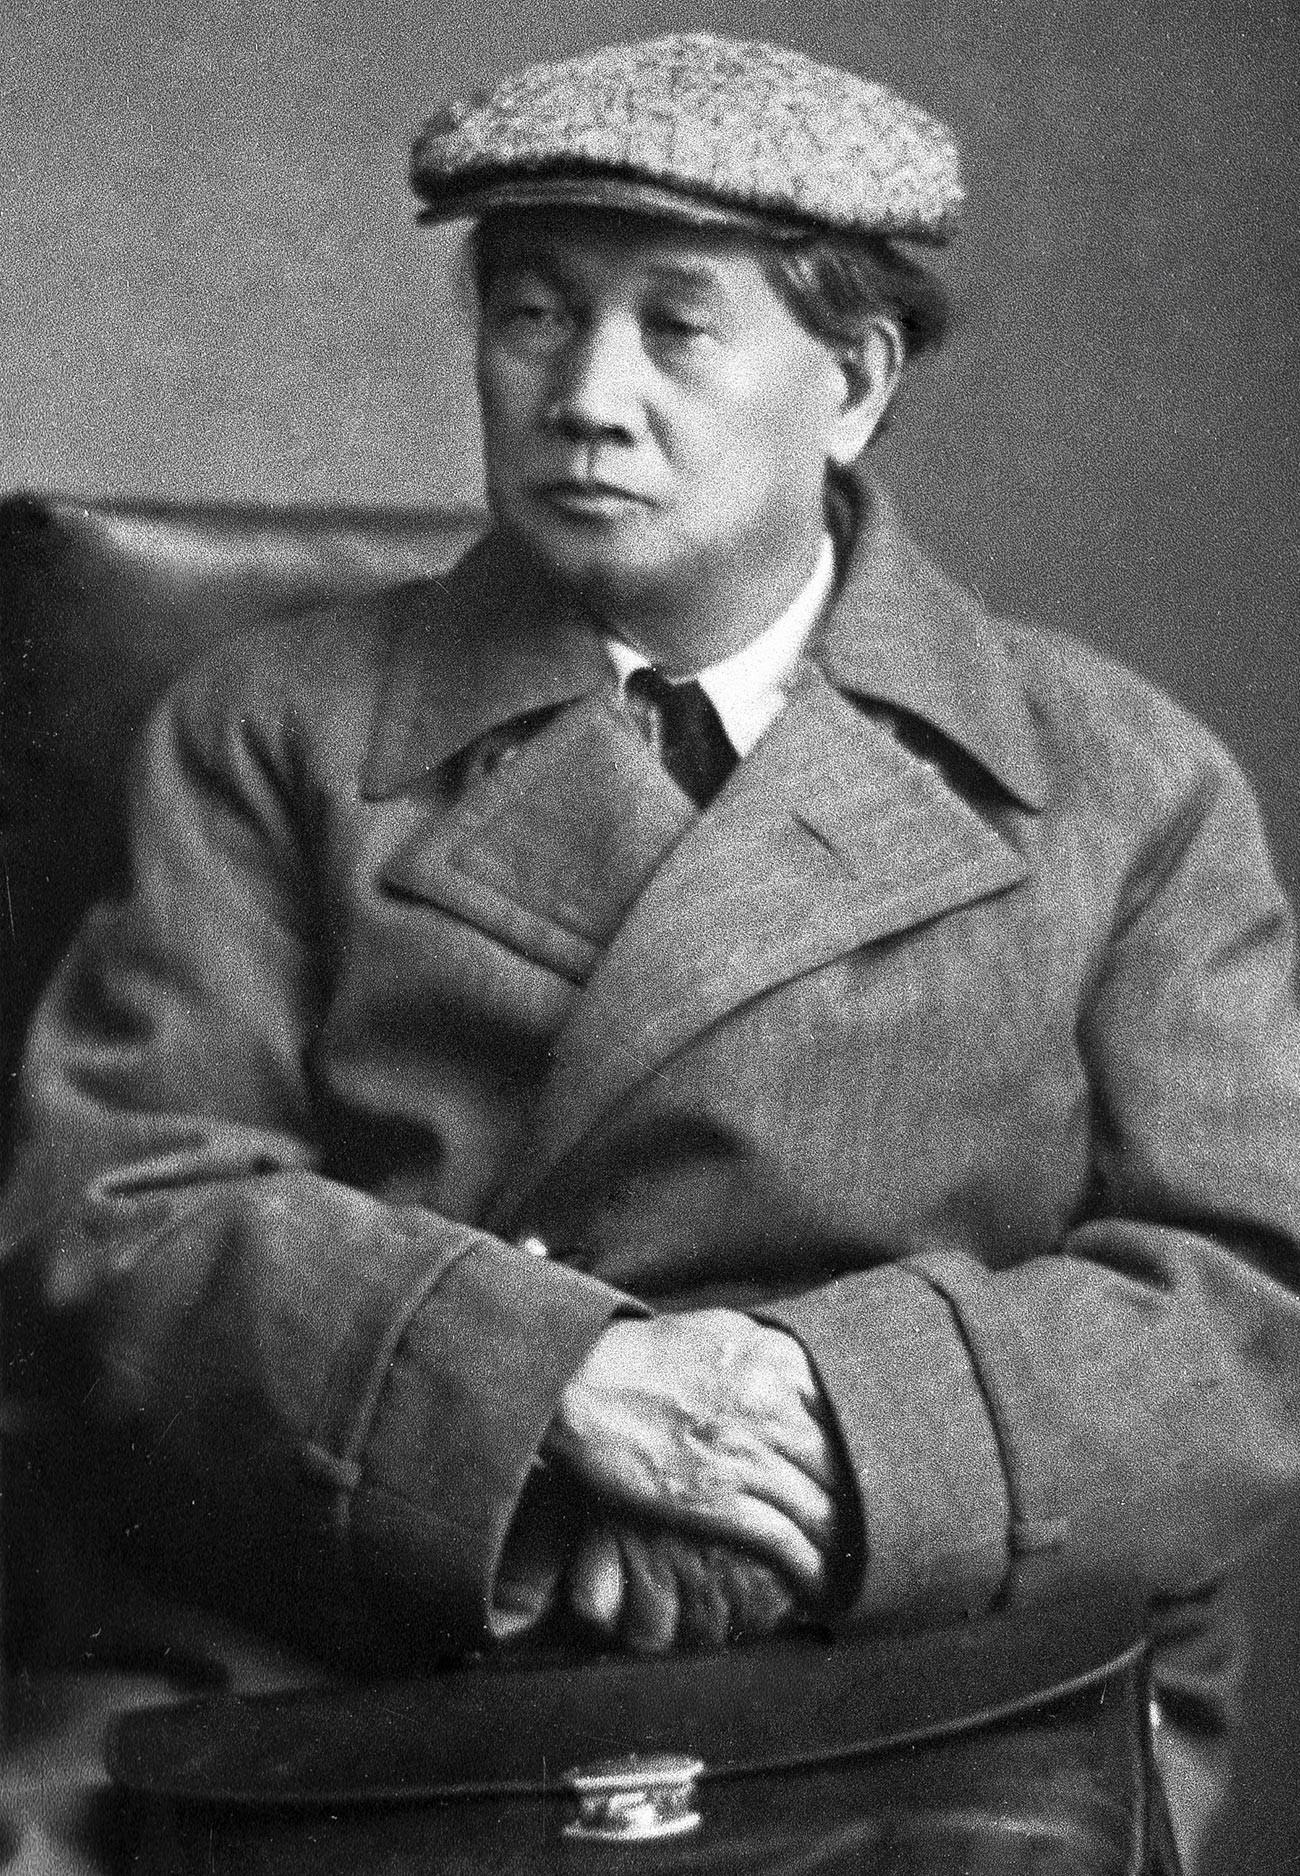 Leade of the Japanese Communist Party, Sen Katayama (1859-1933)